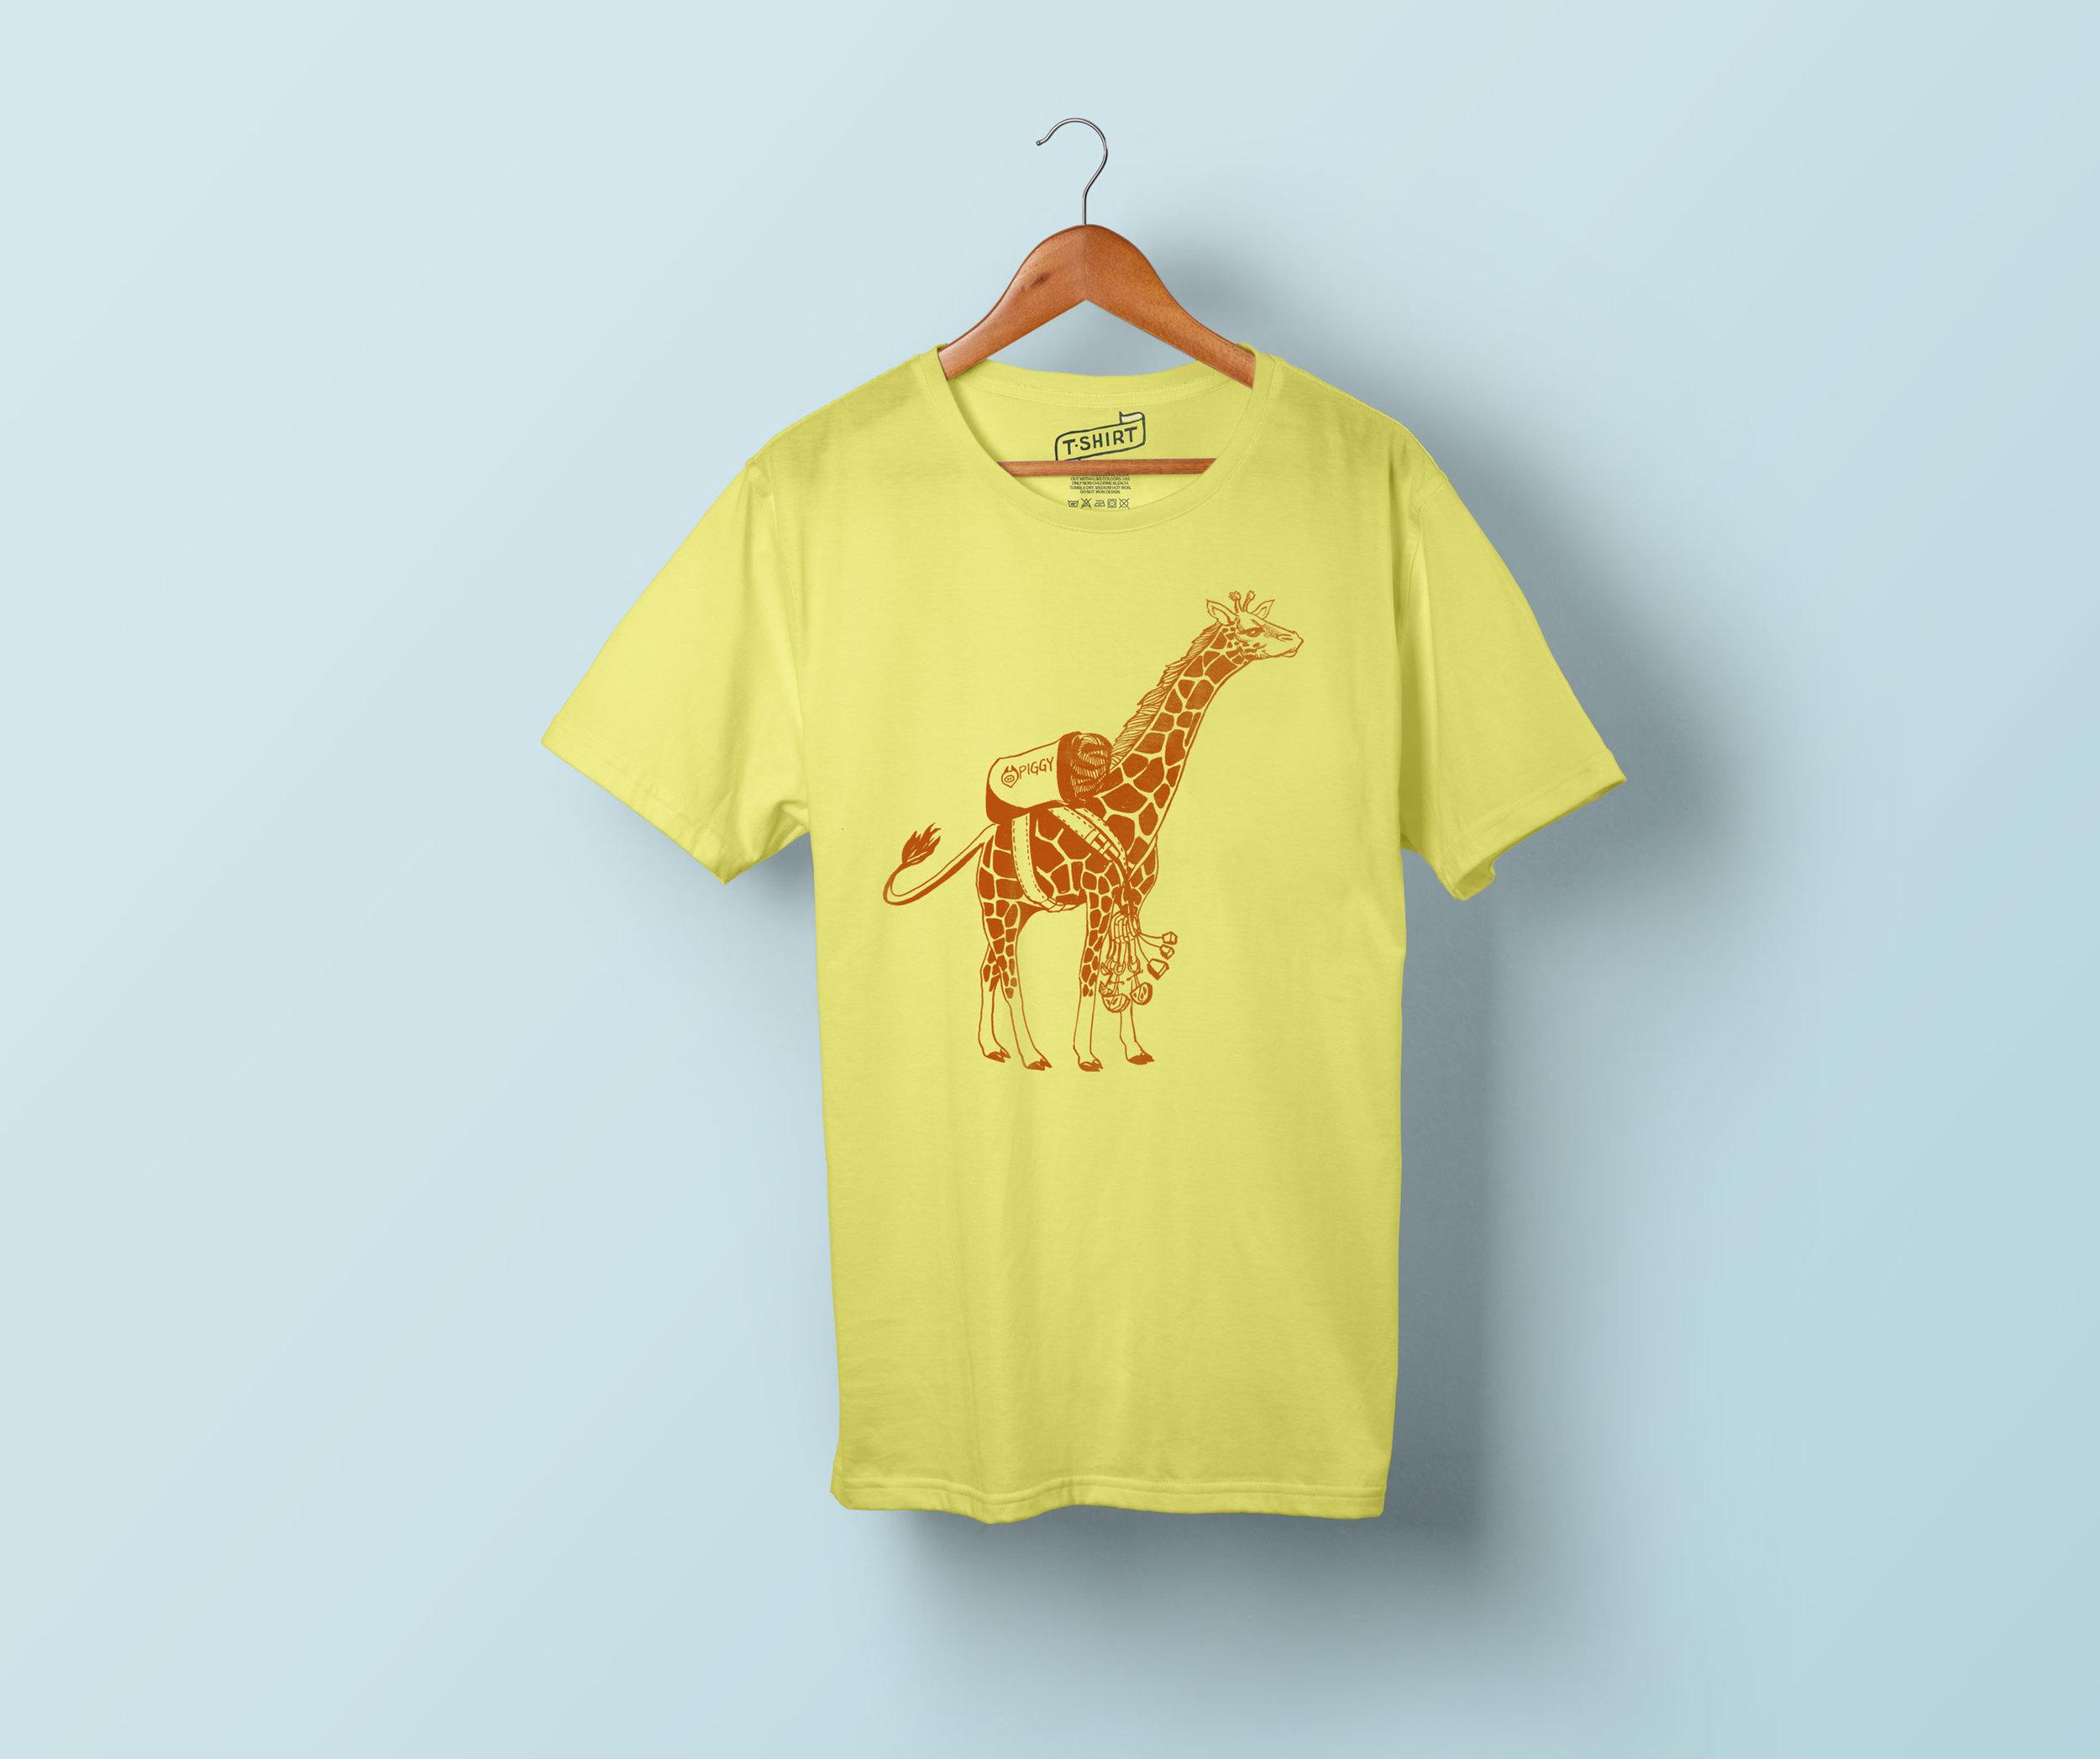 T-Shirt-Hanging-Mockup222.jpg